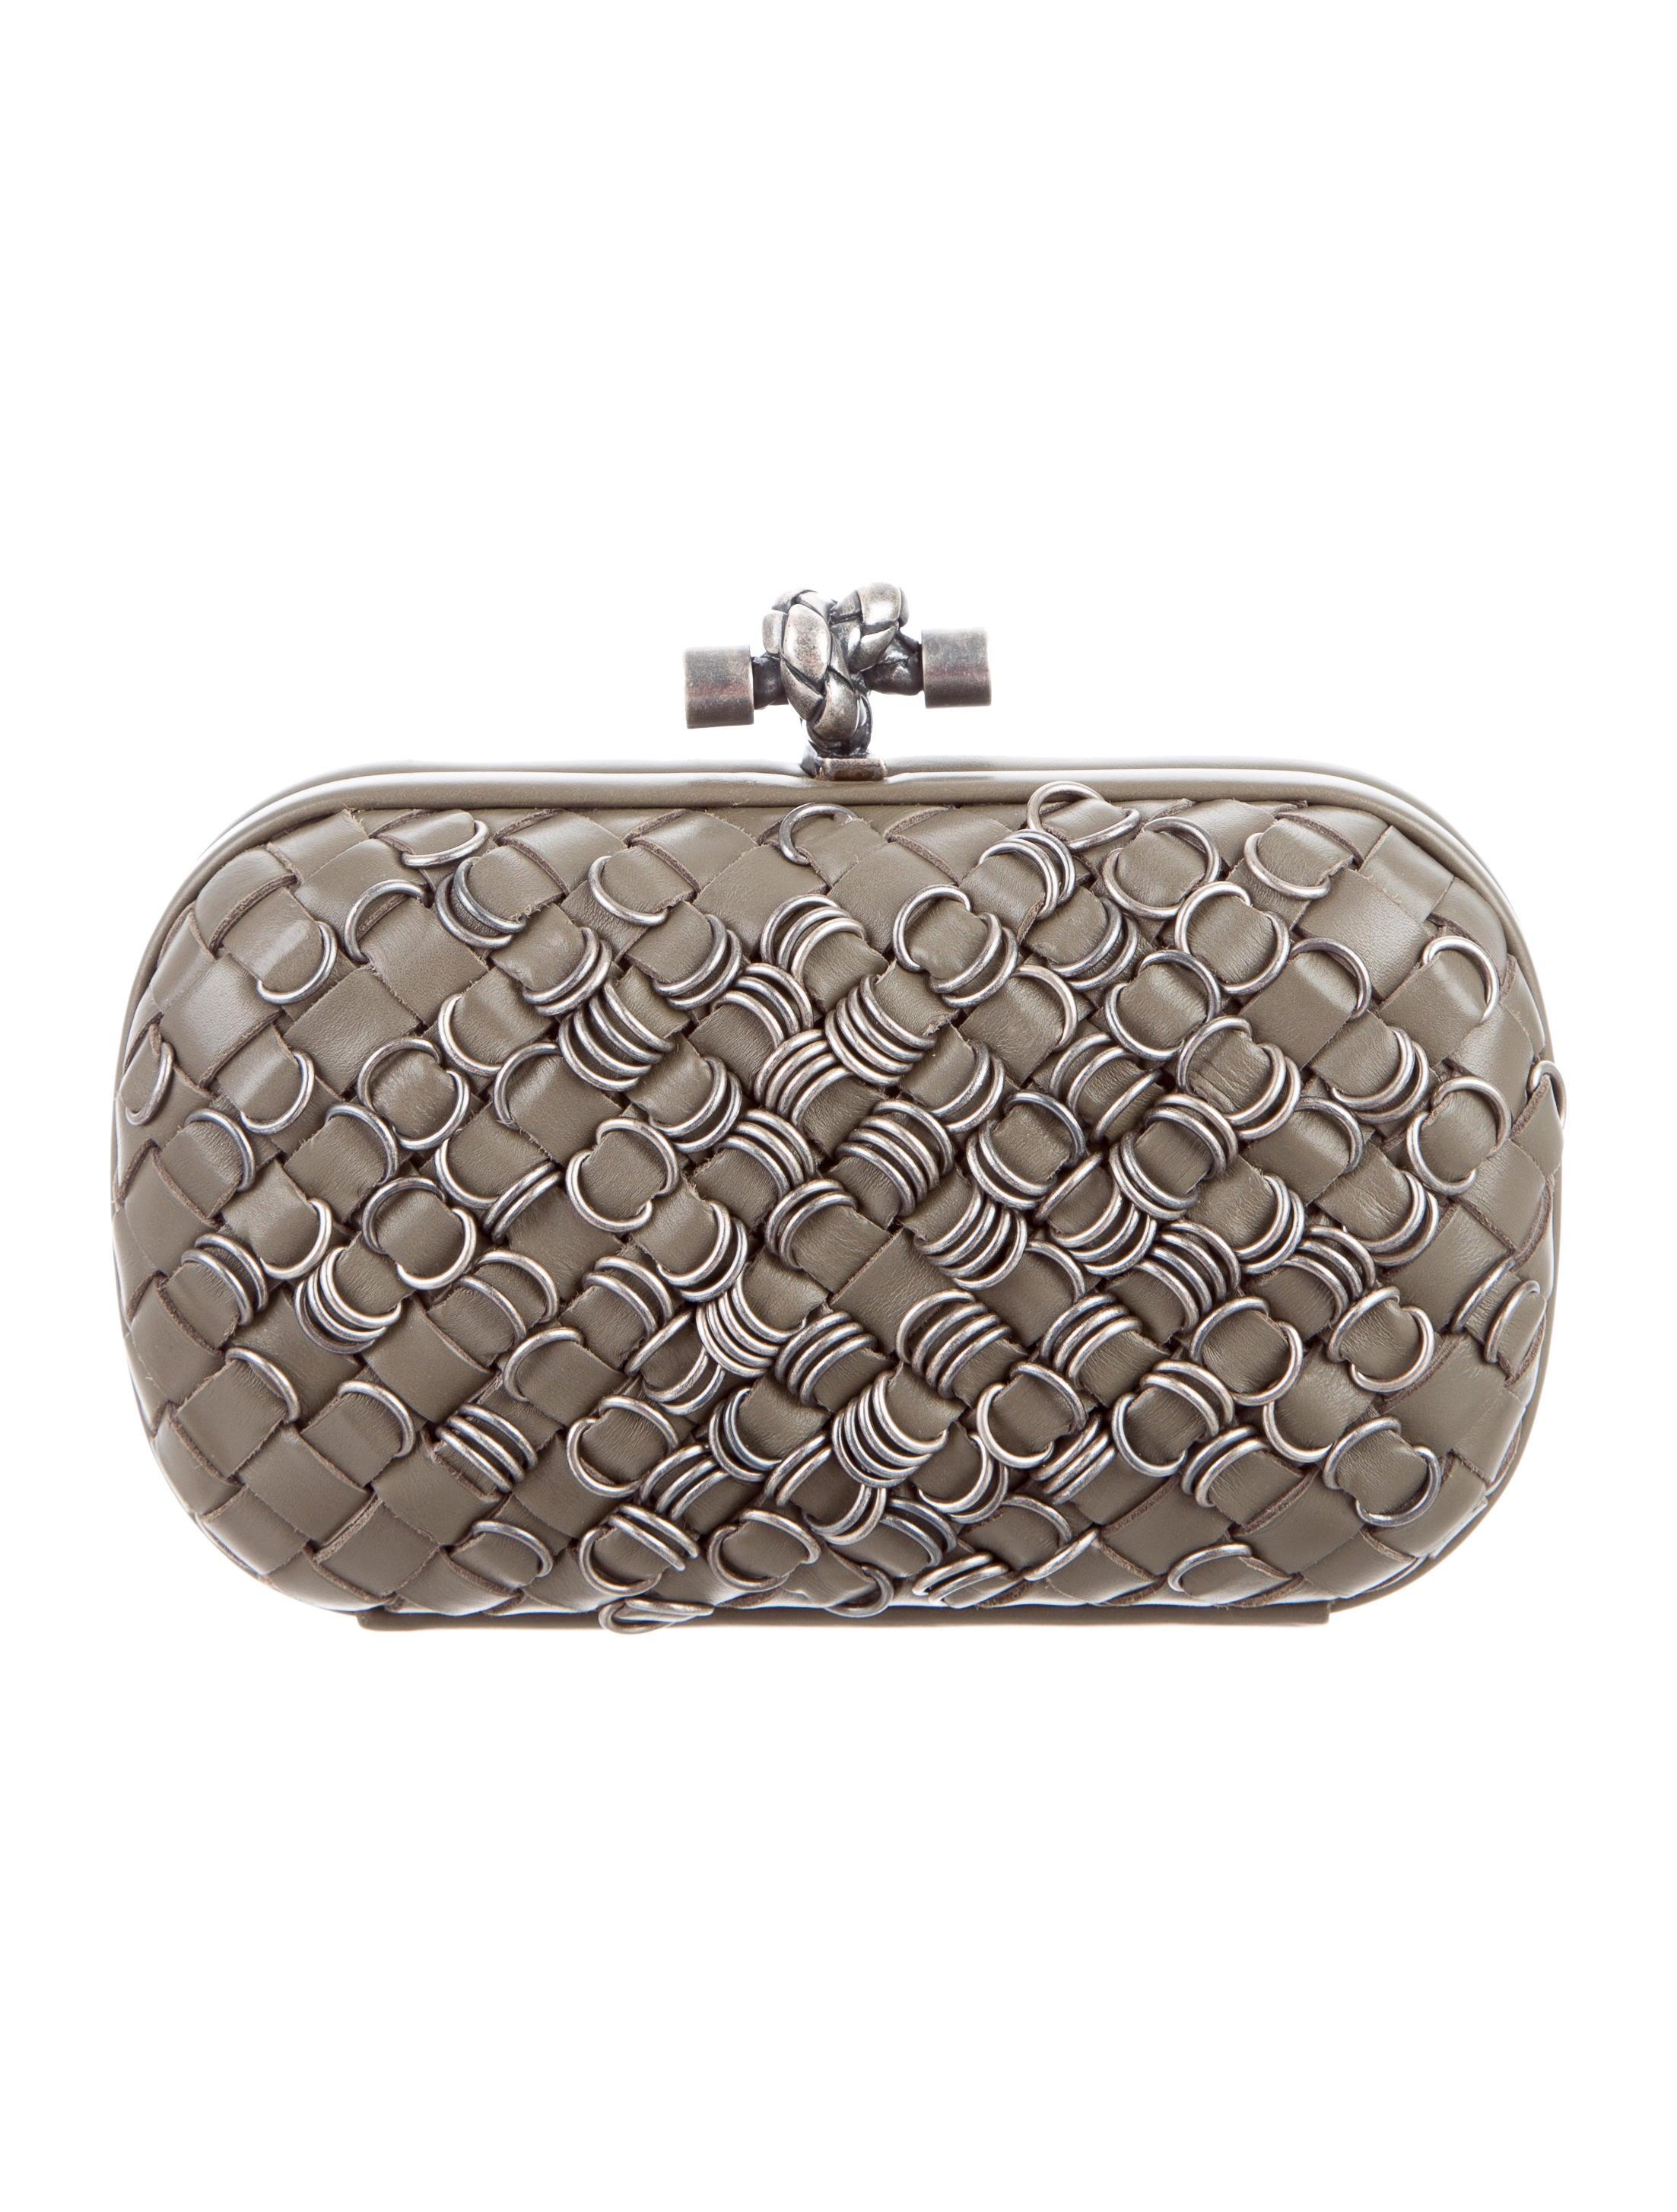 bottega veneta embellished knot clutch handbags bot41911 the realreal. Black Bedroom Furniture Sets. Home Design Ideas